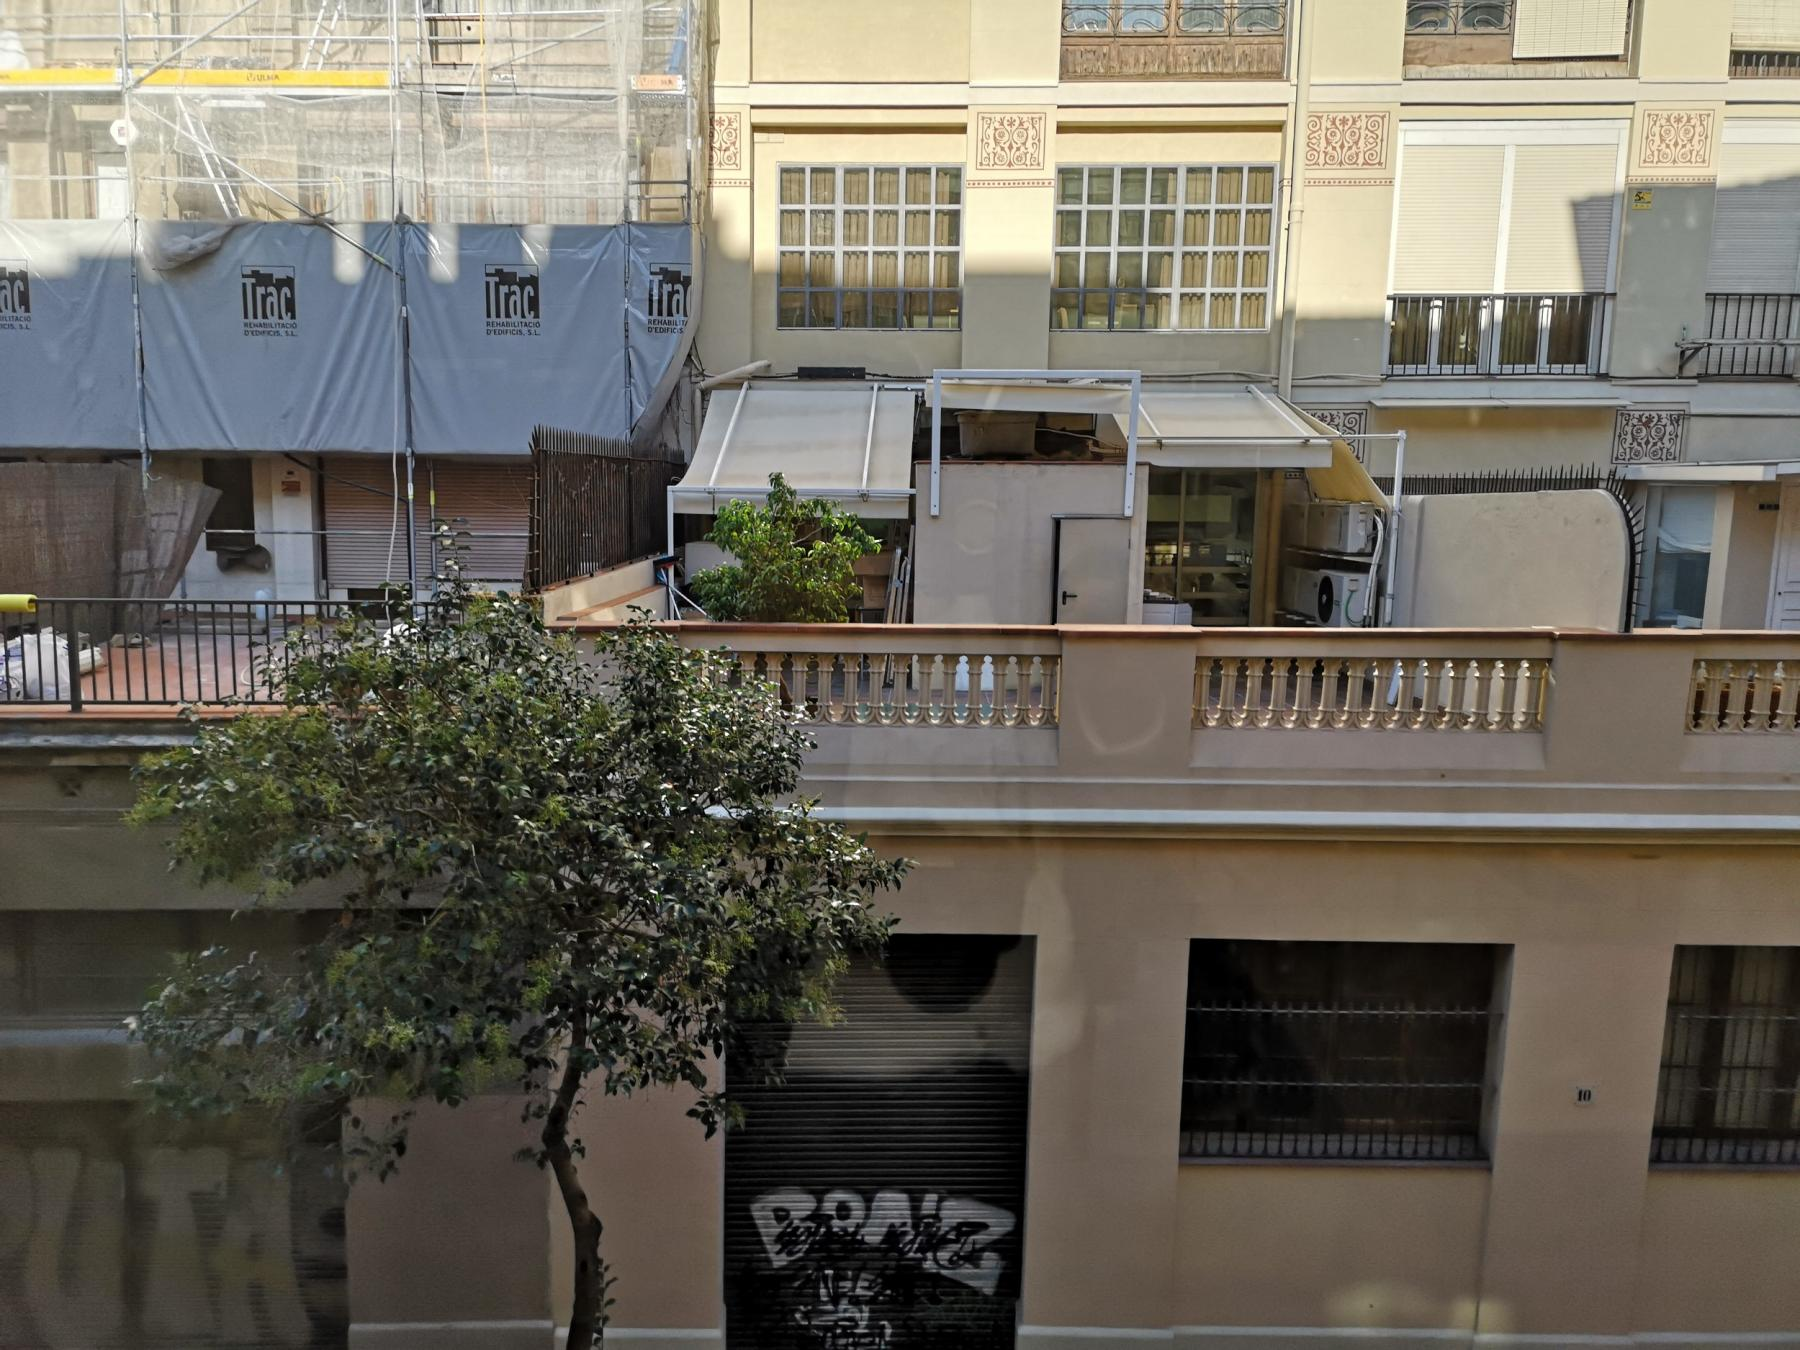 Alquilar oficinas Riera de Sant Miquel 1, Barcelona (13)